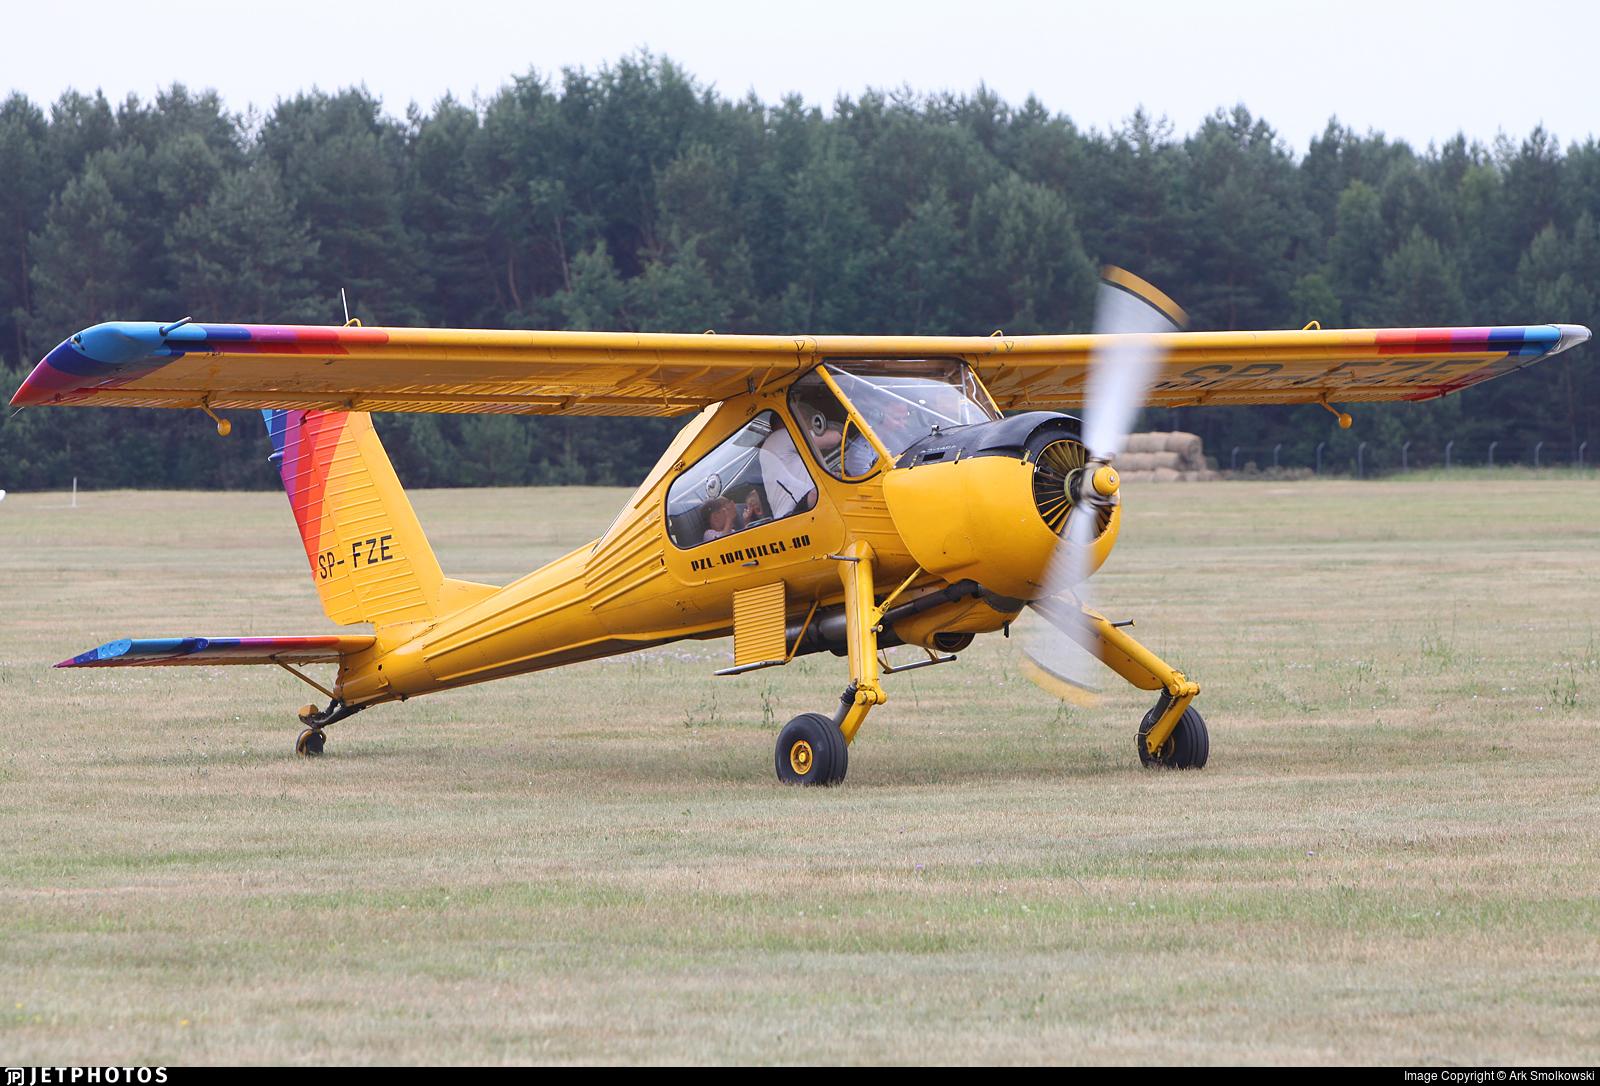 SP-FZE - PZL-Okecie 104 Wilga 80 - White Eagle Aviation